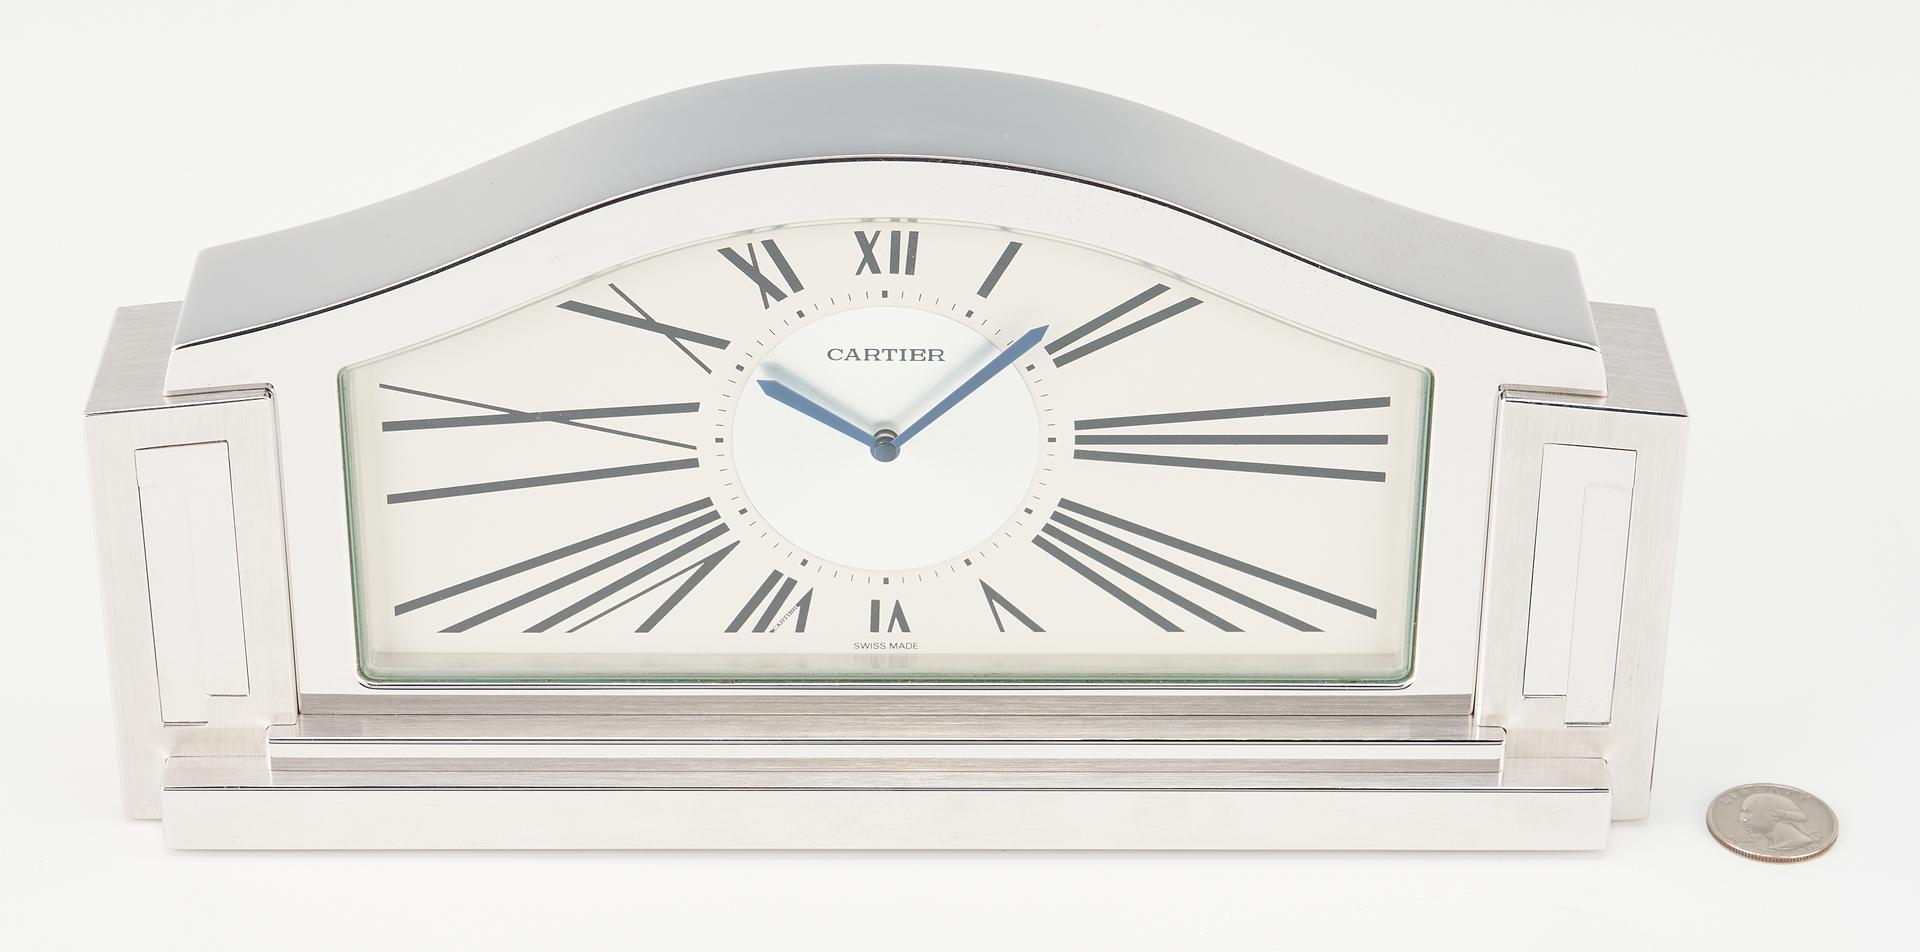 Lot 932: Cartier Art Deco Style Desk Clock